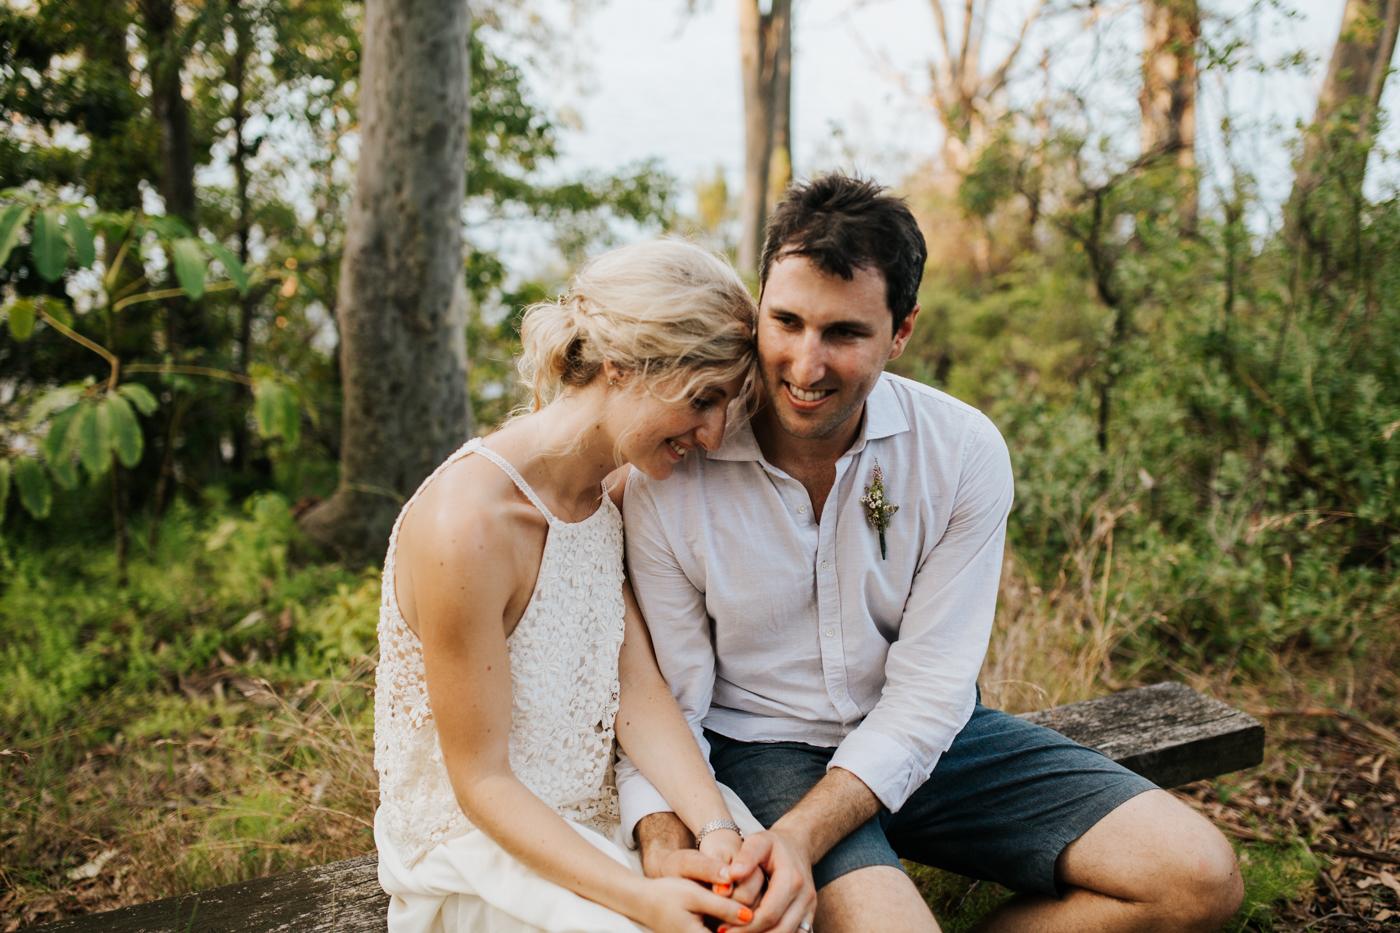 Emma & Ben - Lake Macquarie - Hunter Valley Wedding - Samantha Heather Photography-216.jpg